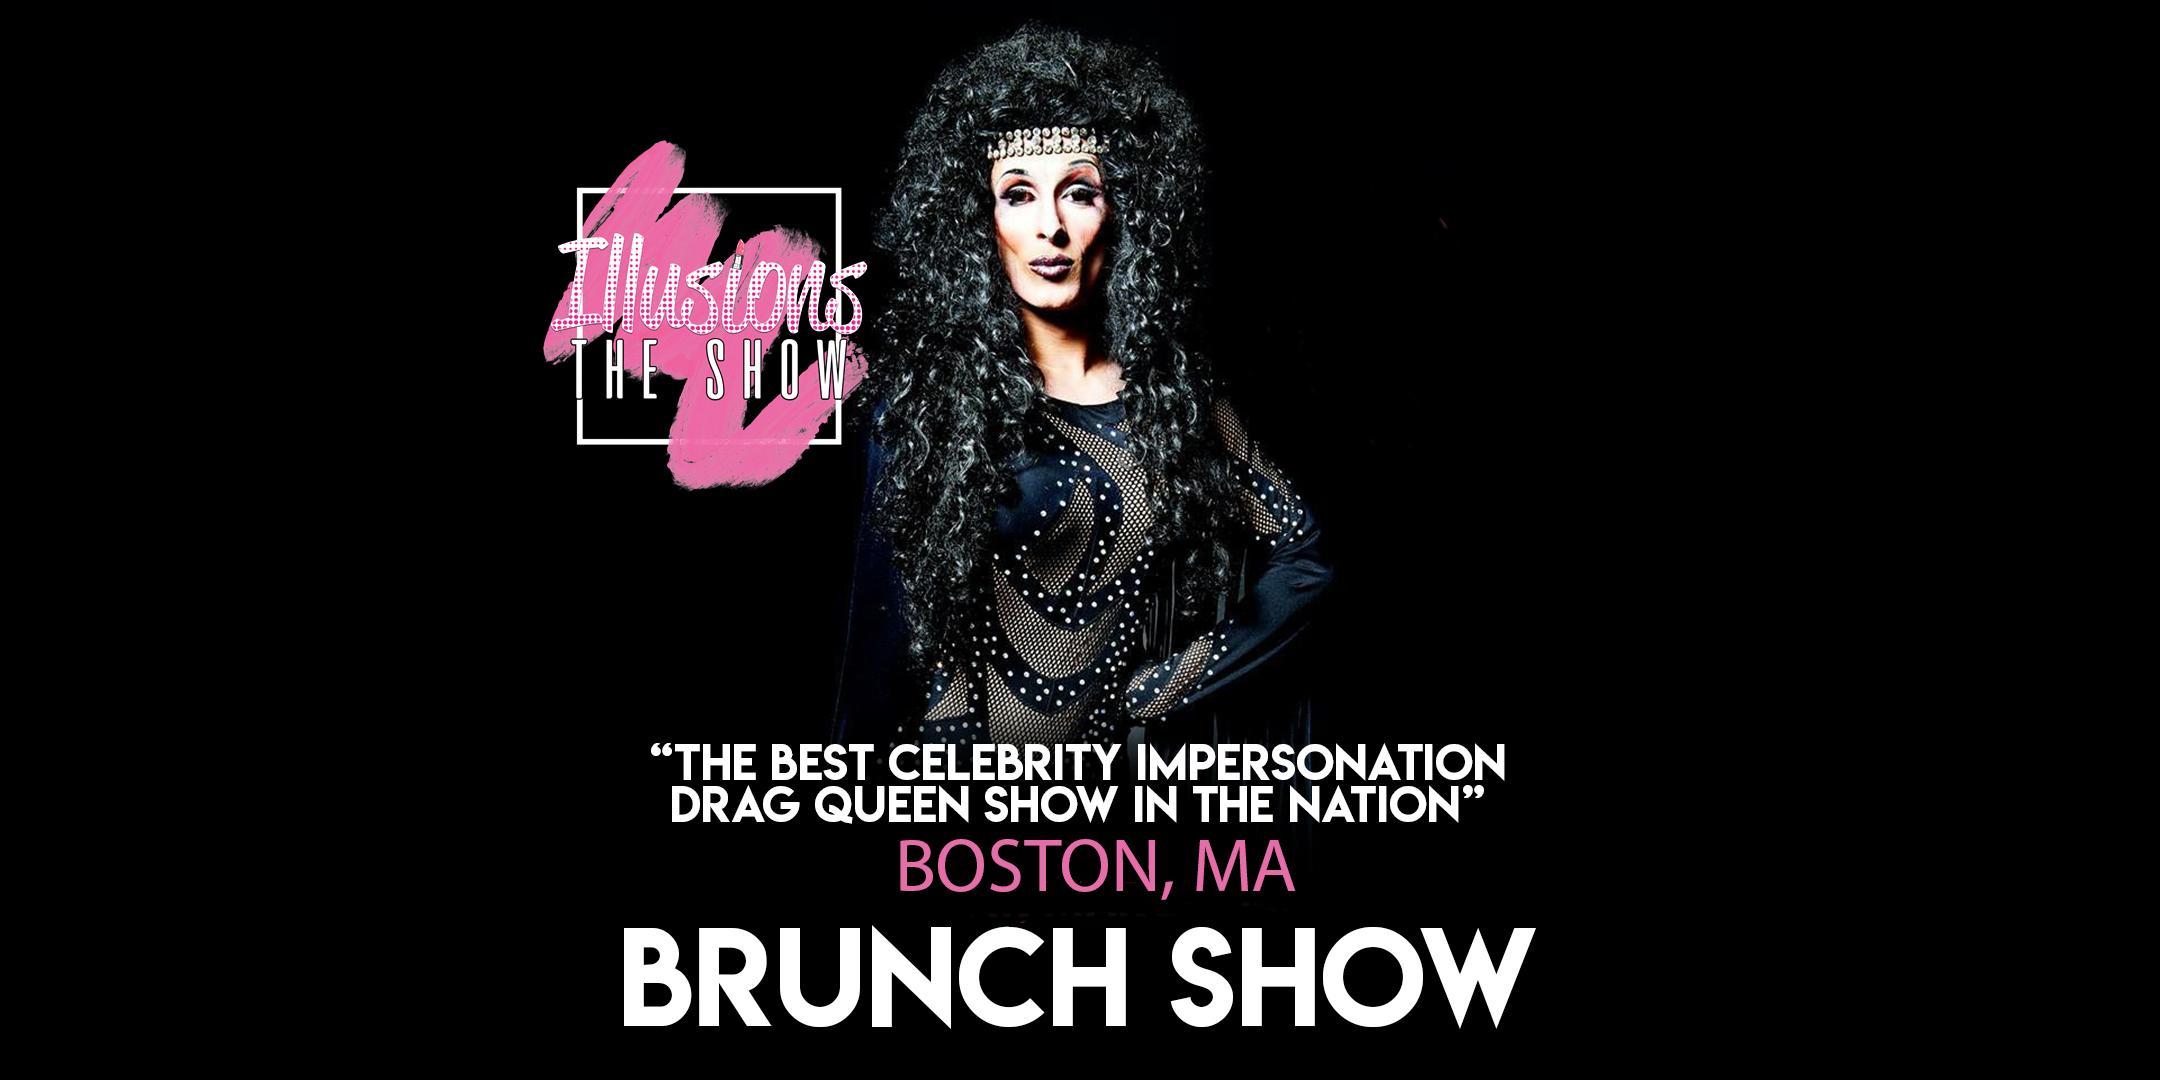 Illusions The Drag Brunch Boston - Drag Queen Brunch Show - Boston, MA